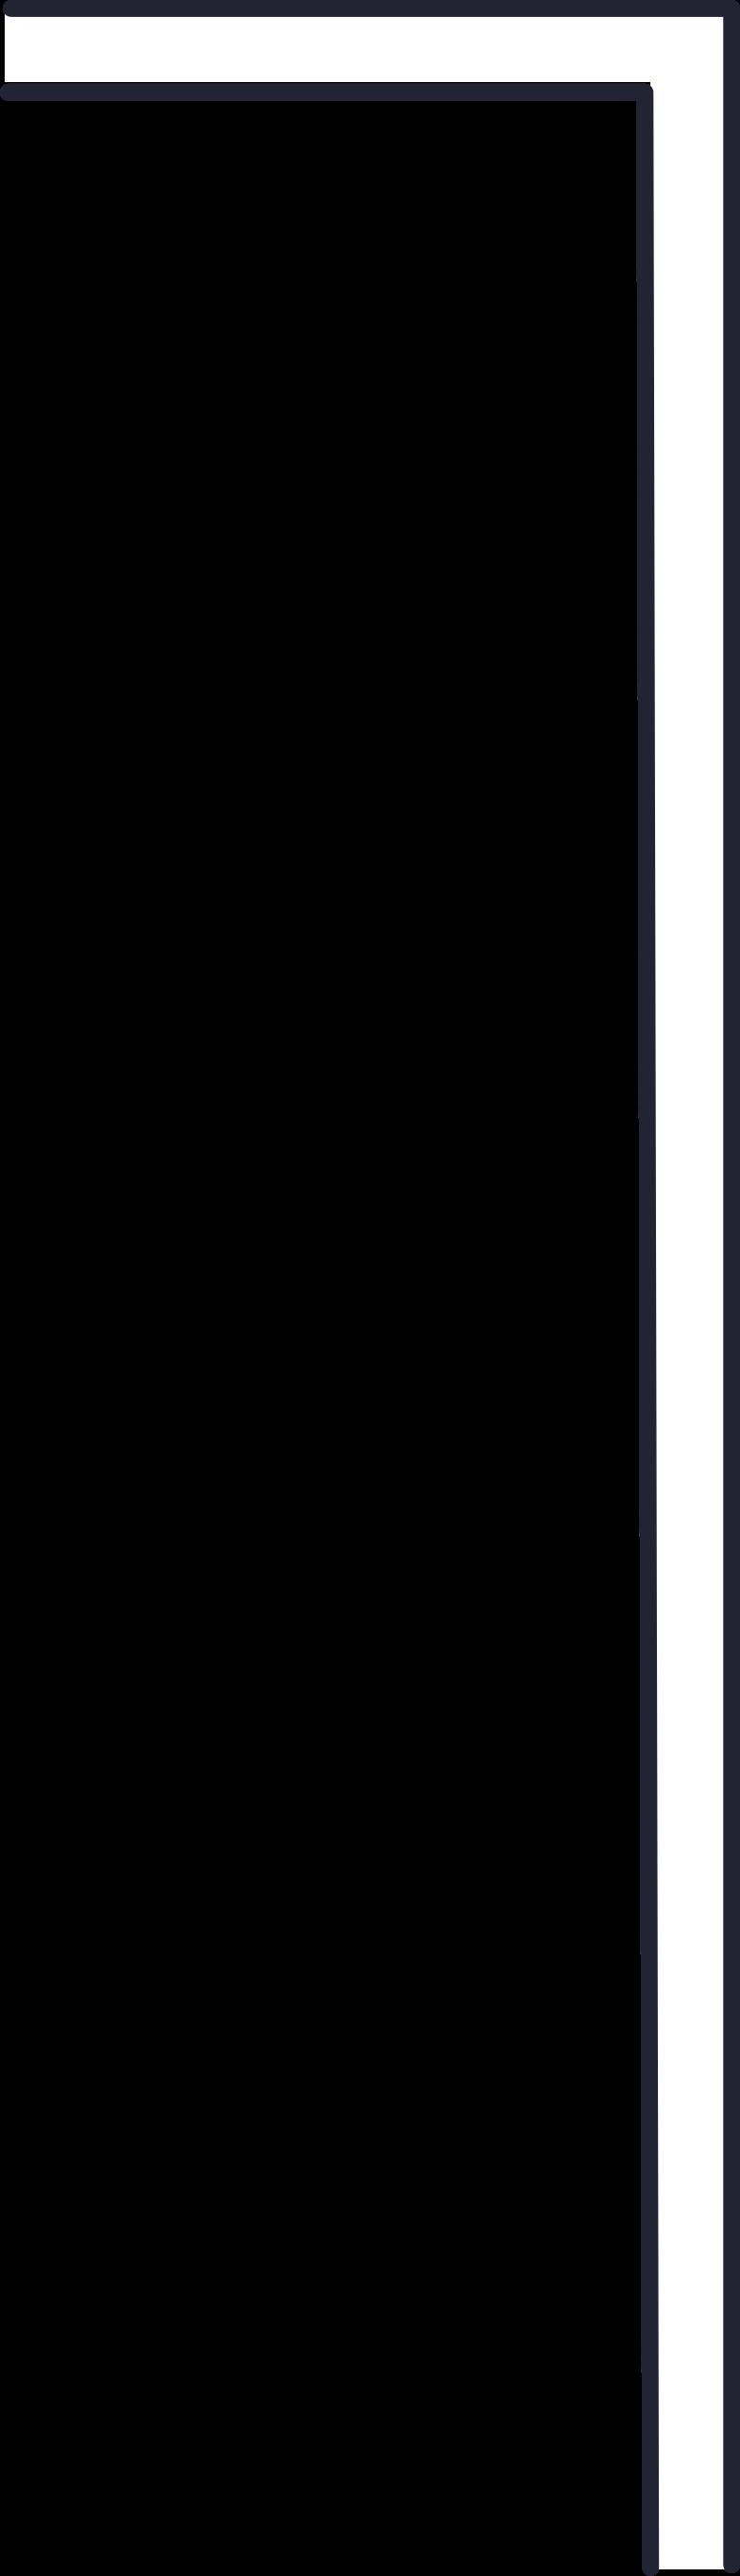 waiting  door Clipart illustration in PNG, SVG